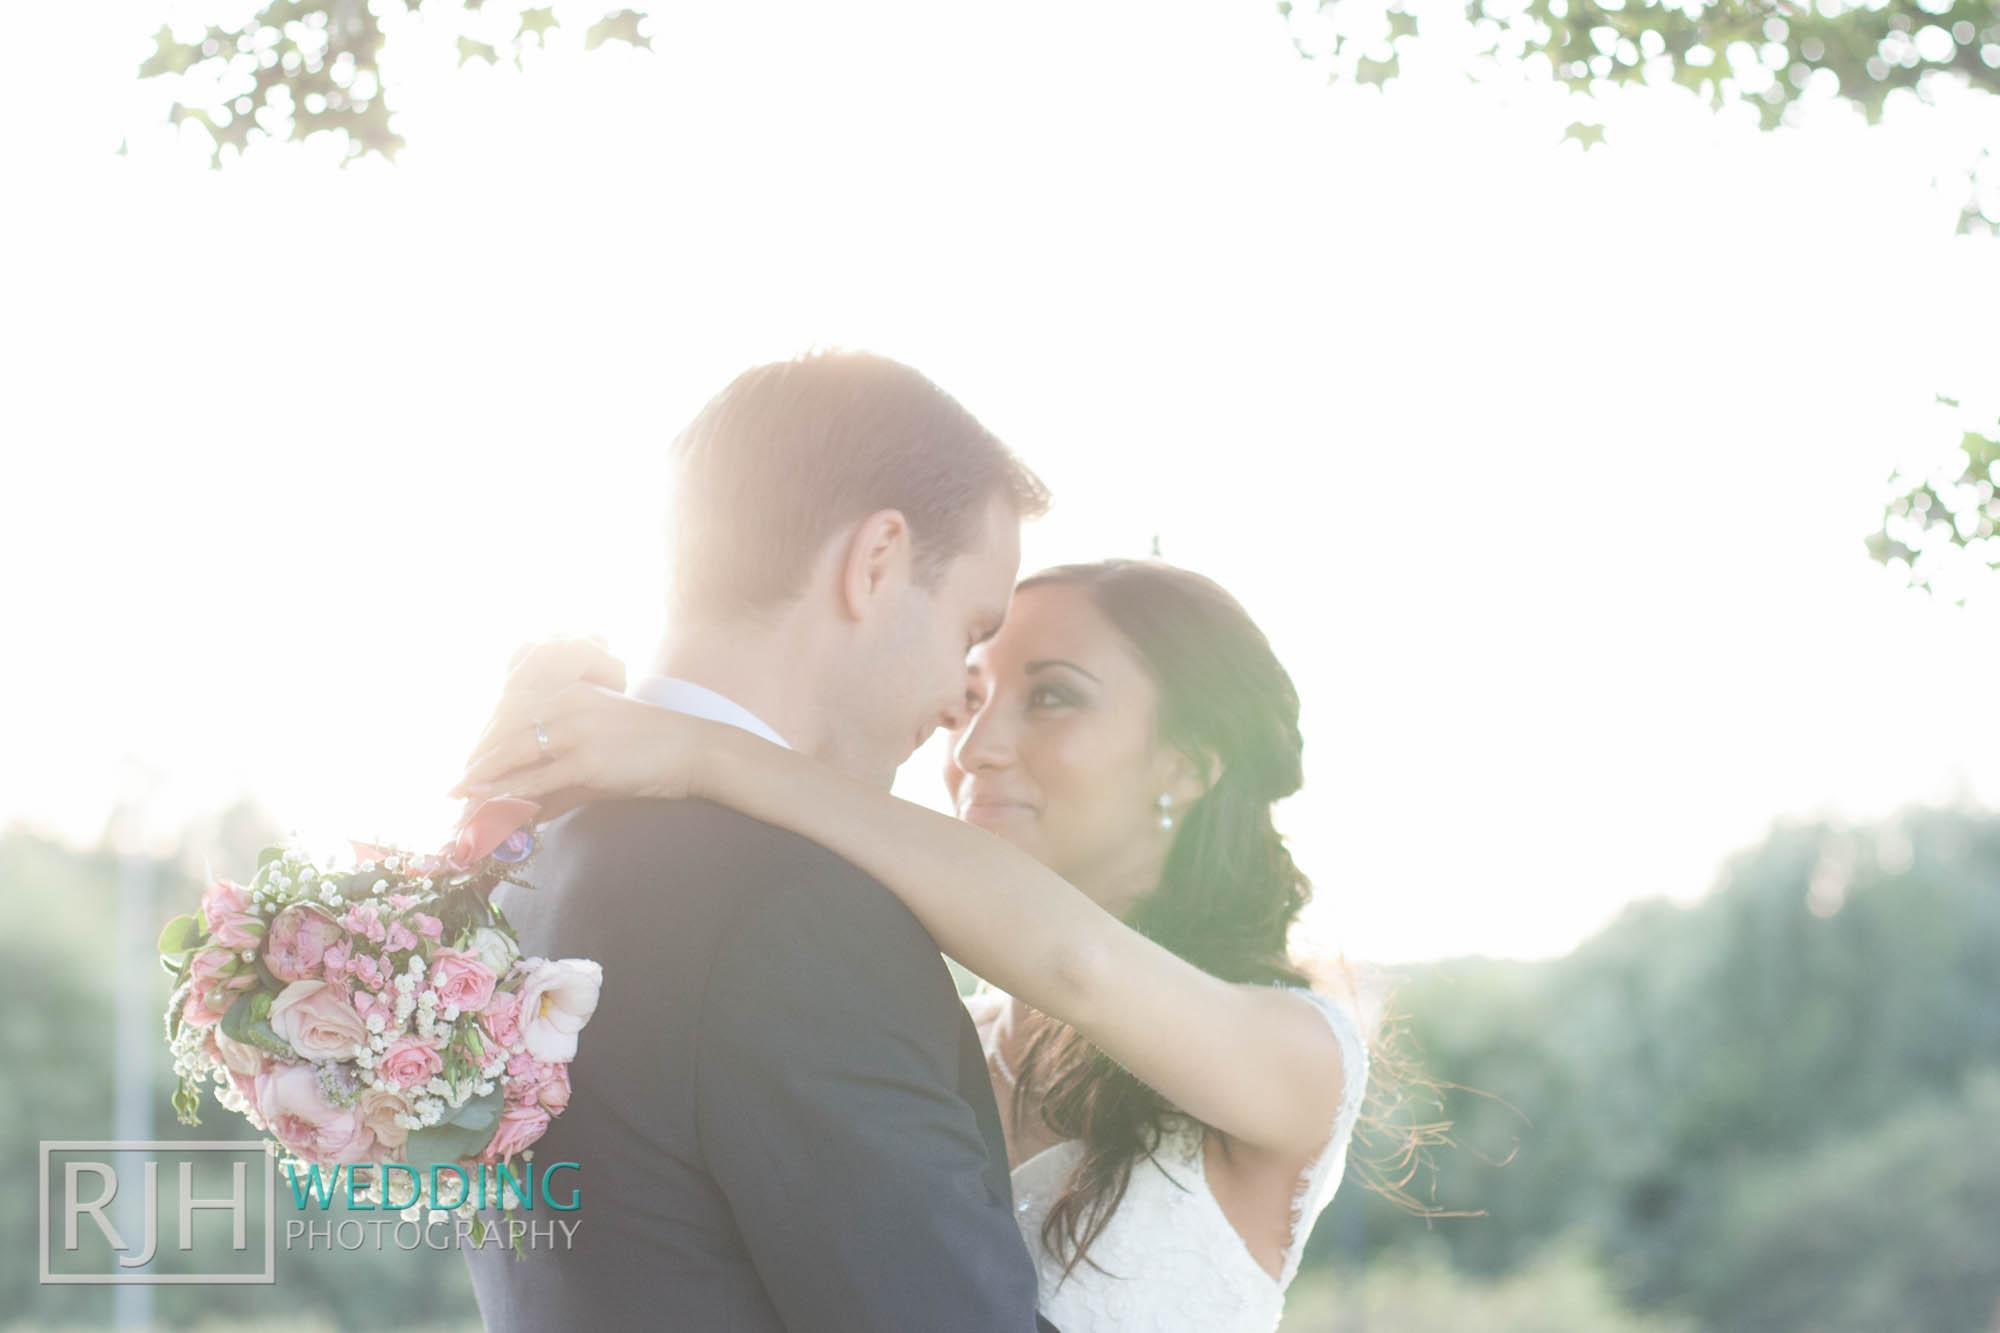 RJH Wedding Photography_Tankersley Manor Wedding_43.jpg